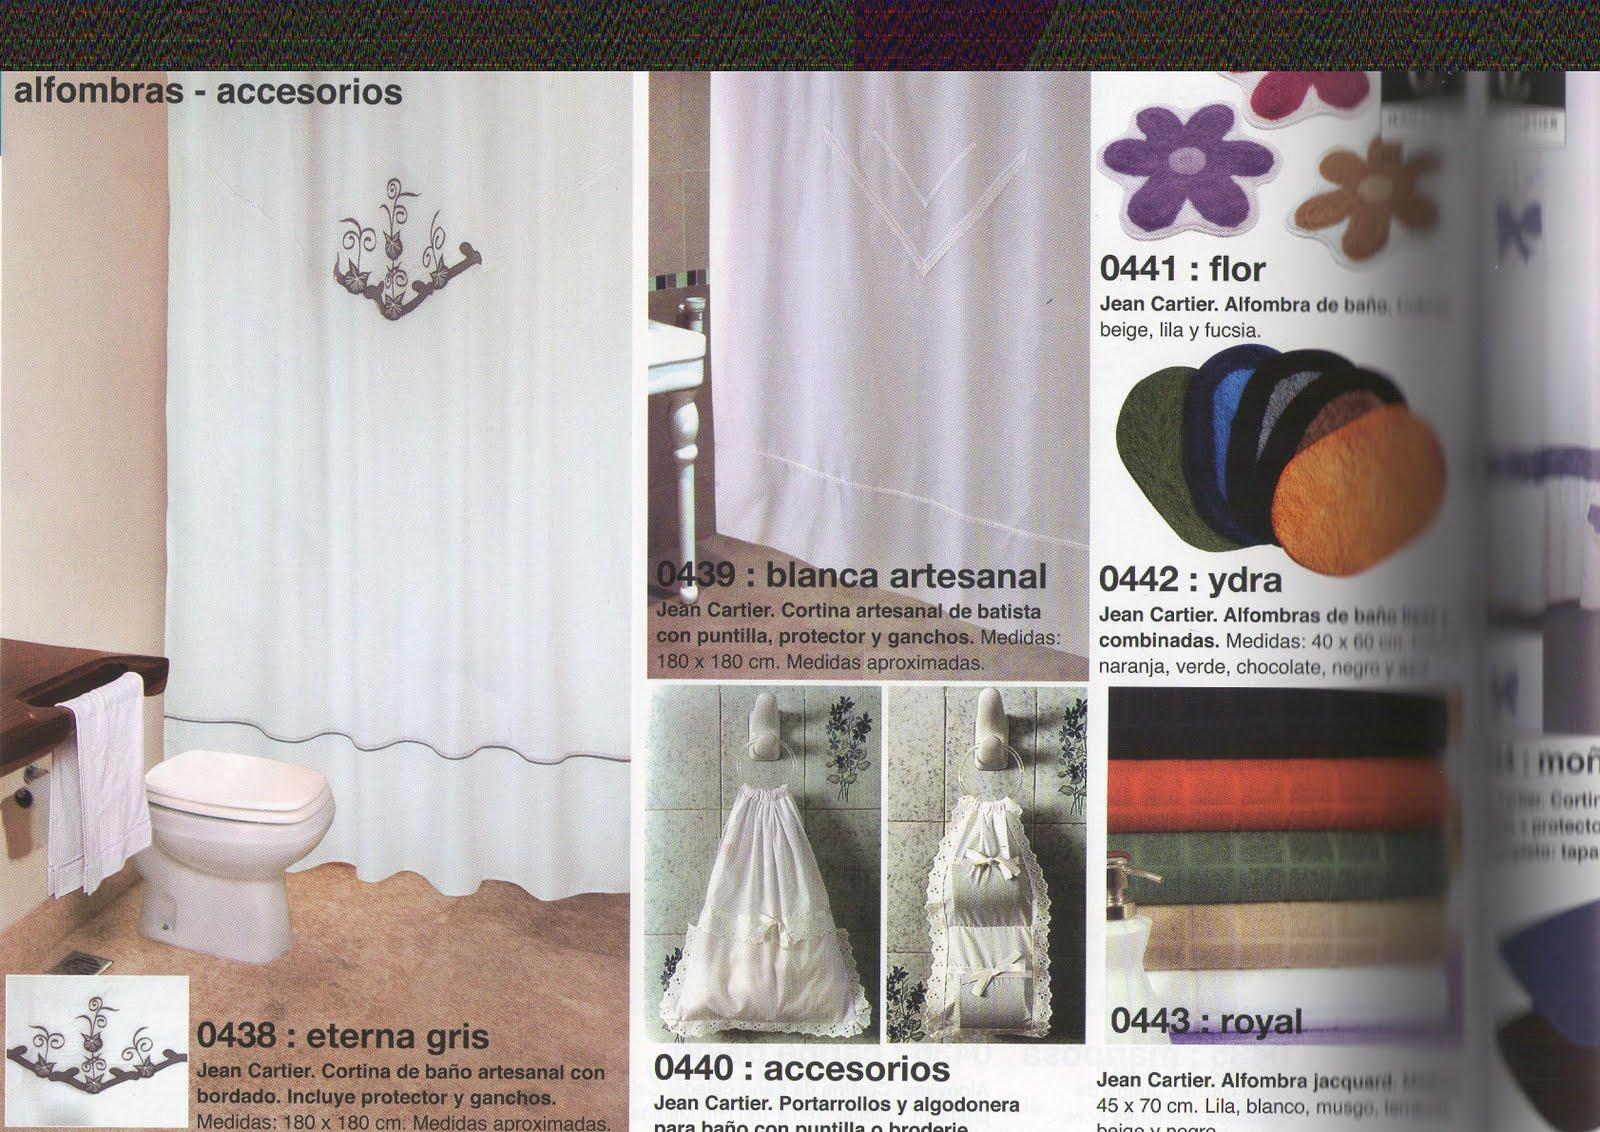 Jean cartier temporada oto o invierno 2011 cortinas de for Fabrica de ganchos para cortinas de bano